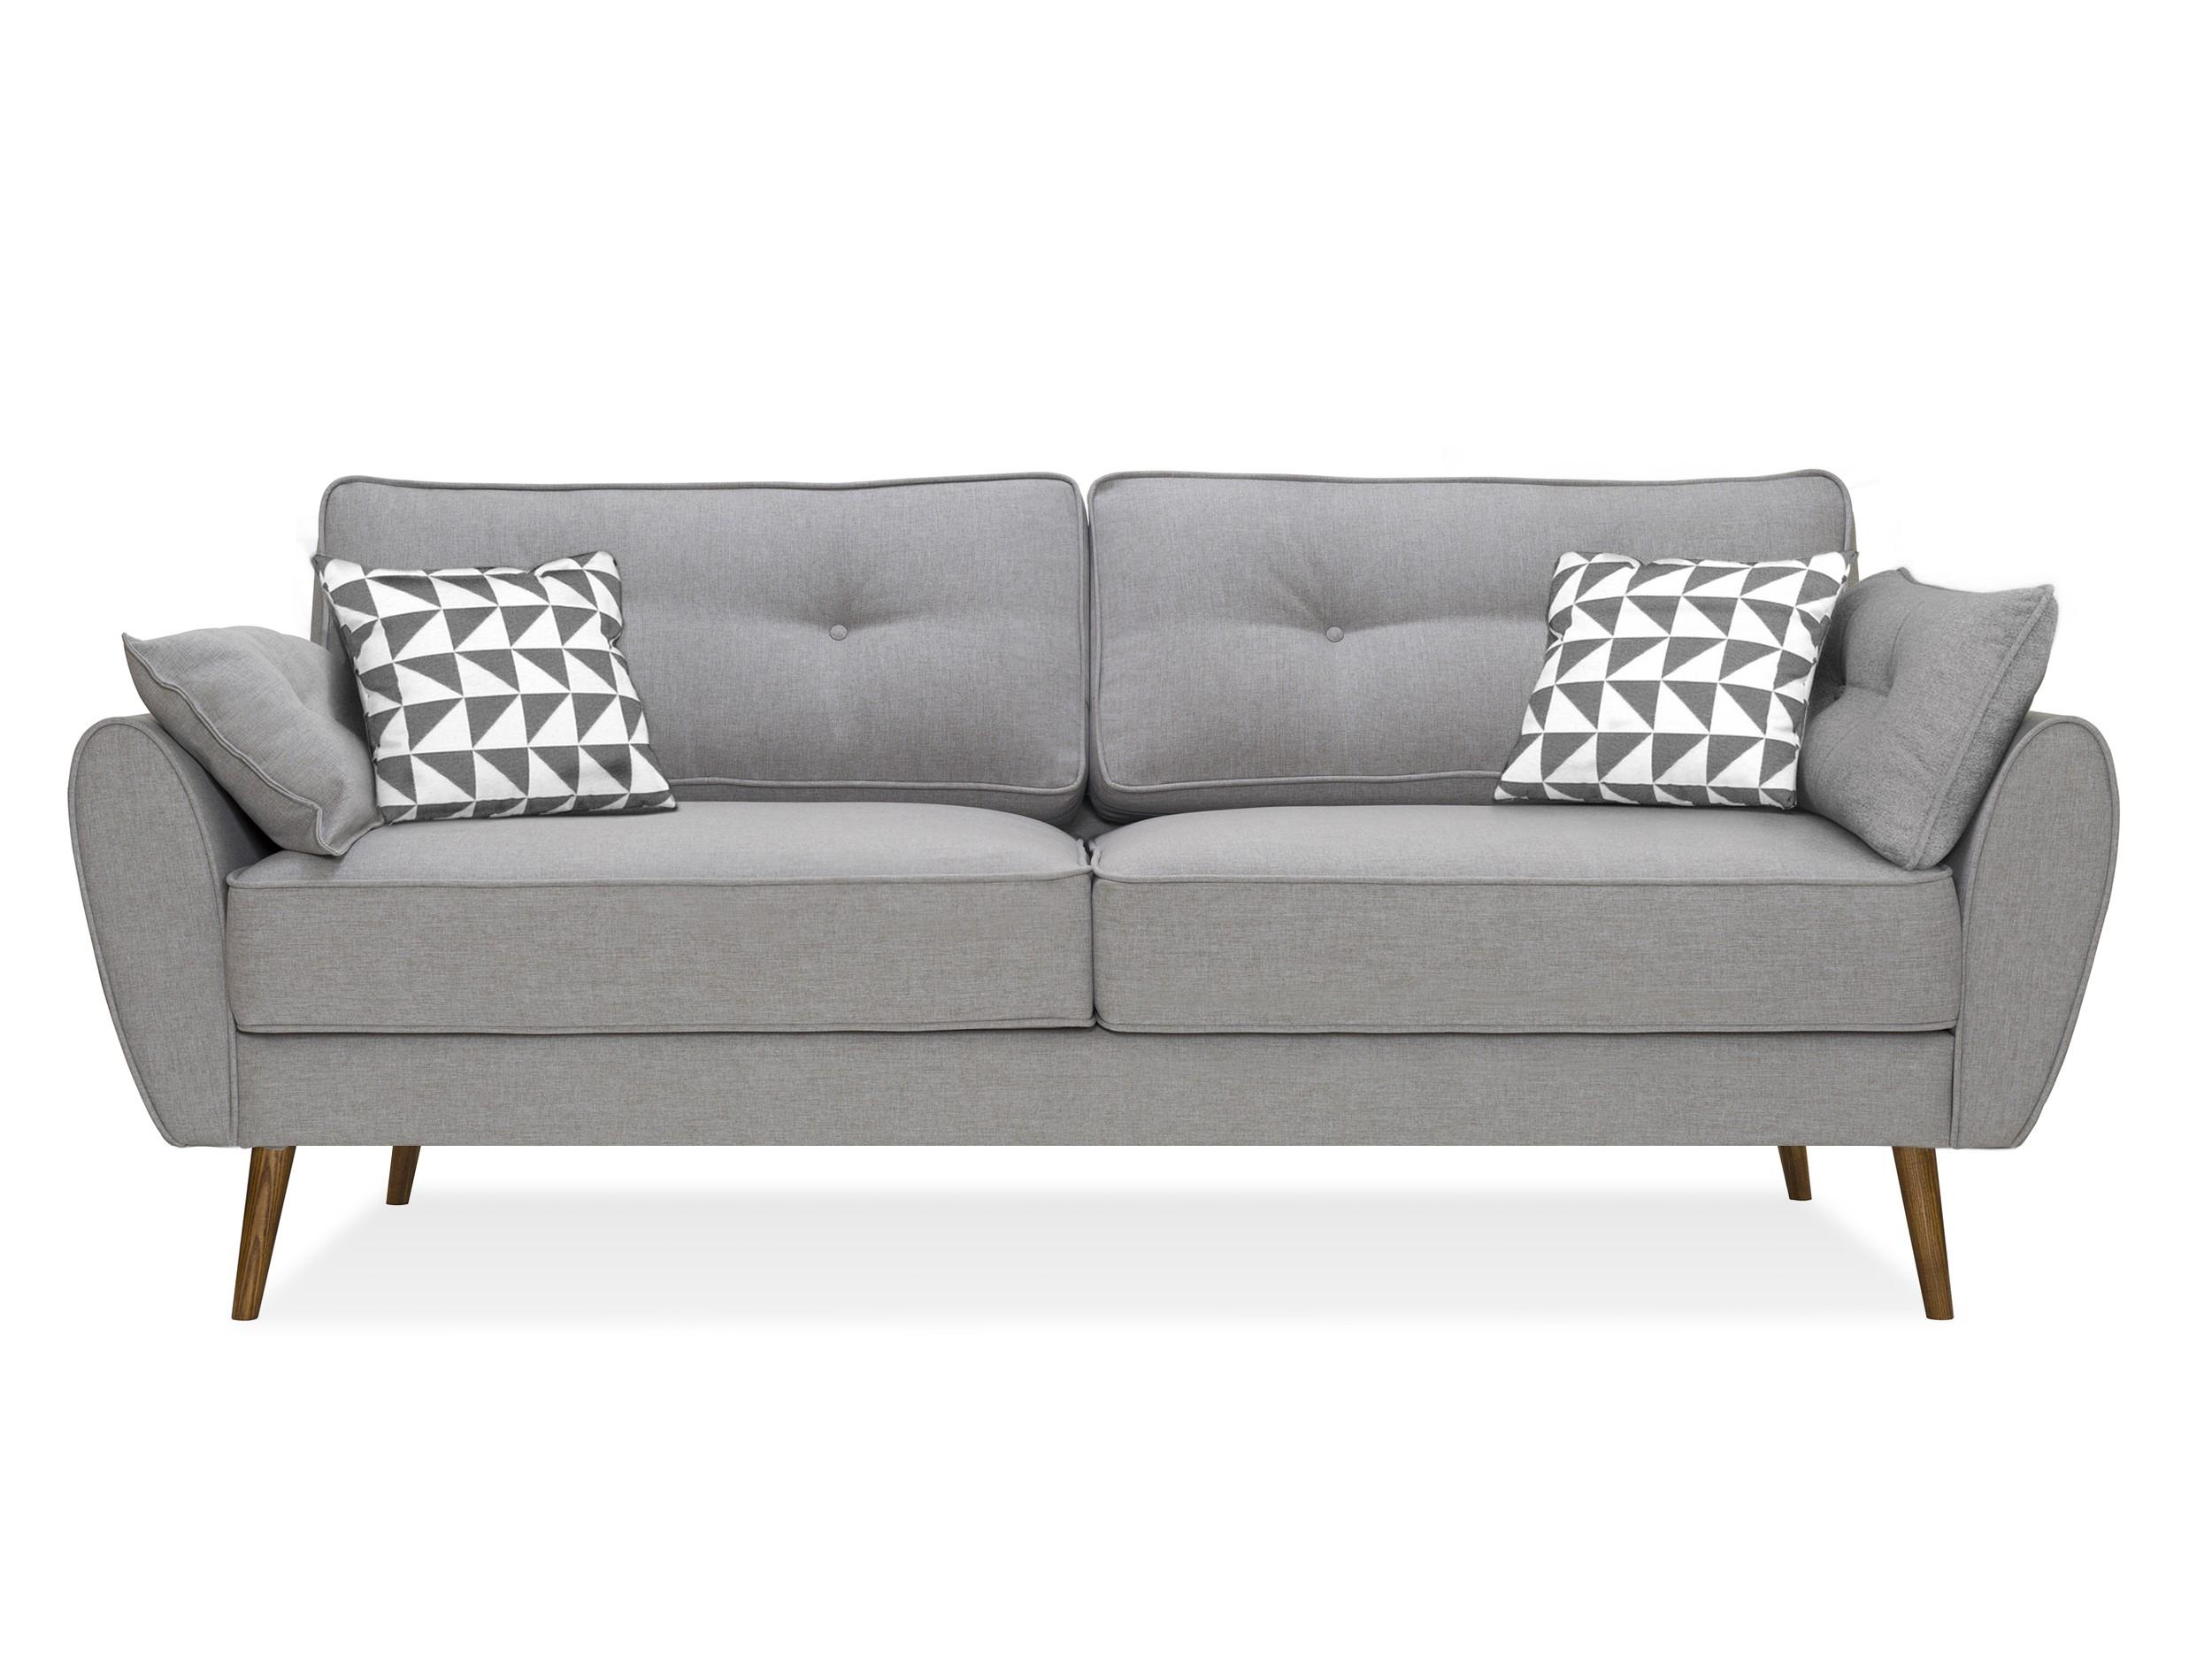 Myfurnish диван vogue серый  66706/43